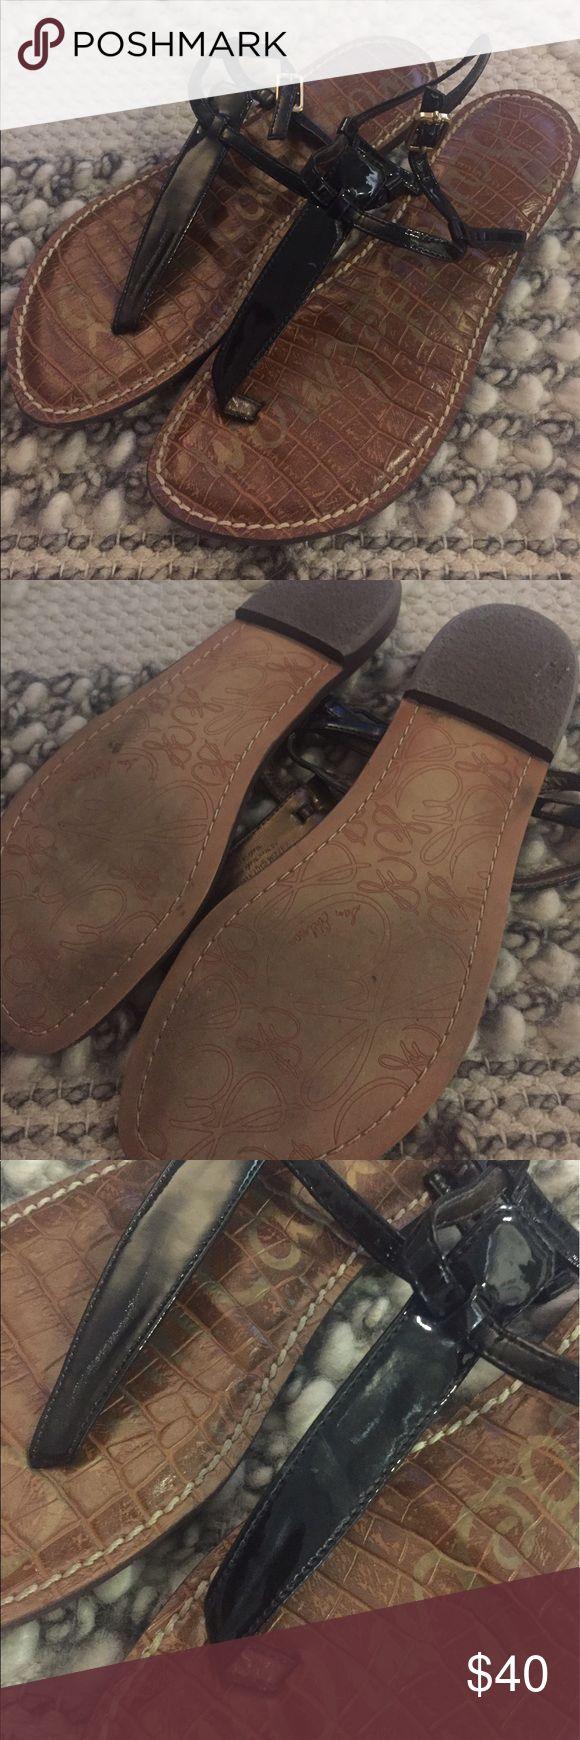 Sam Edelman Gigi Thong Sandal Black Sam Edelman Gigi Sandal. Like new - only worn a few times. Adjustable ankle strap Sam Edelman Shoes Sandals